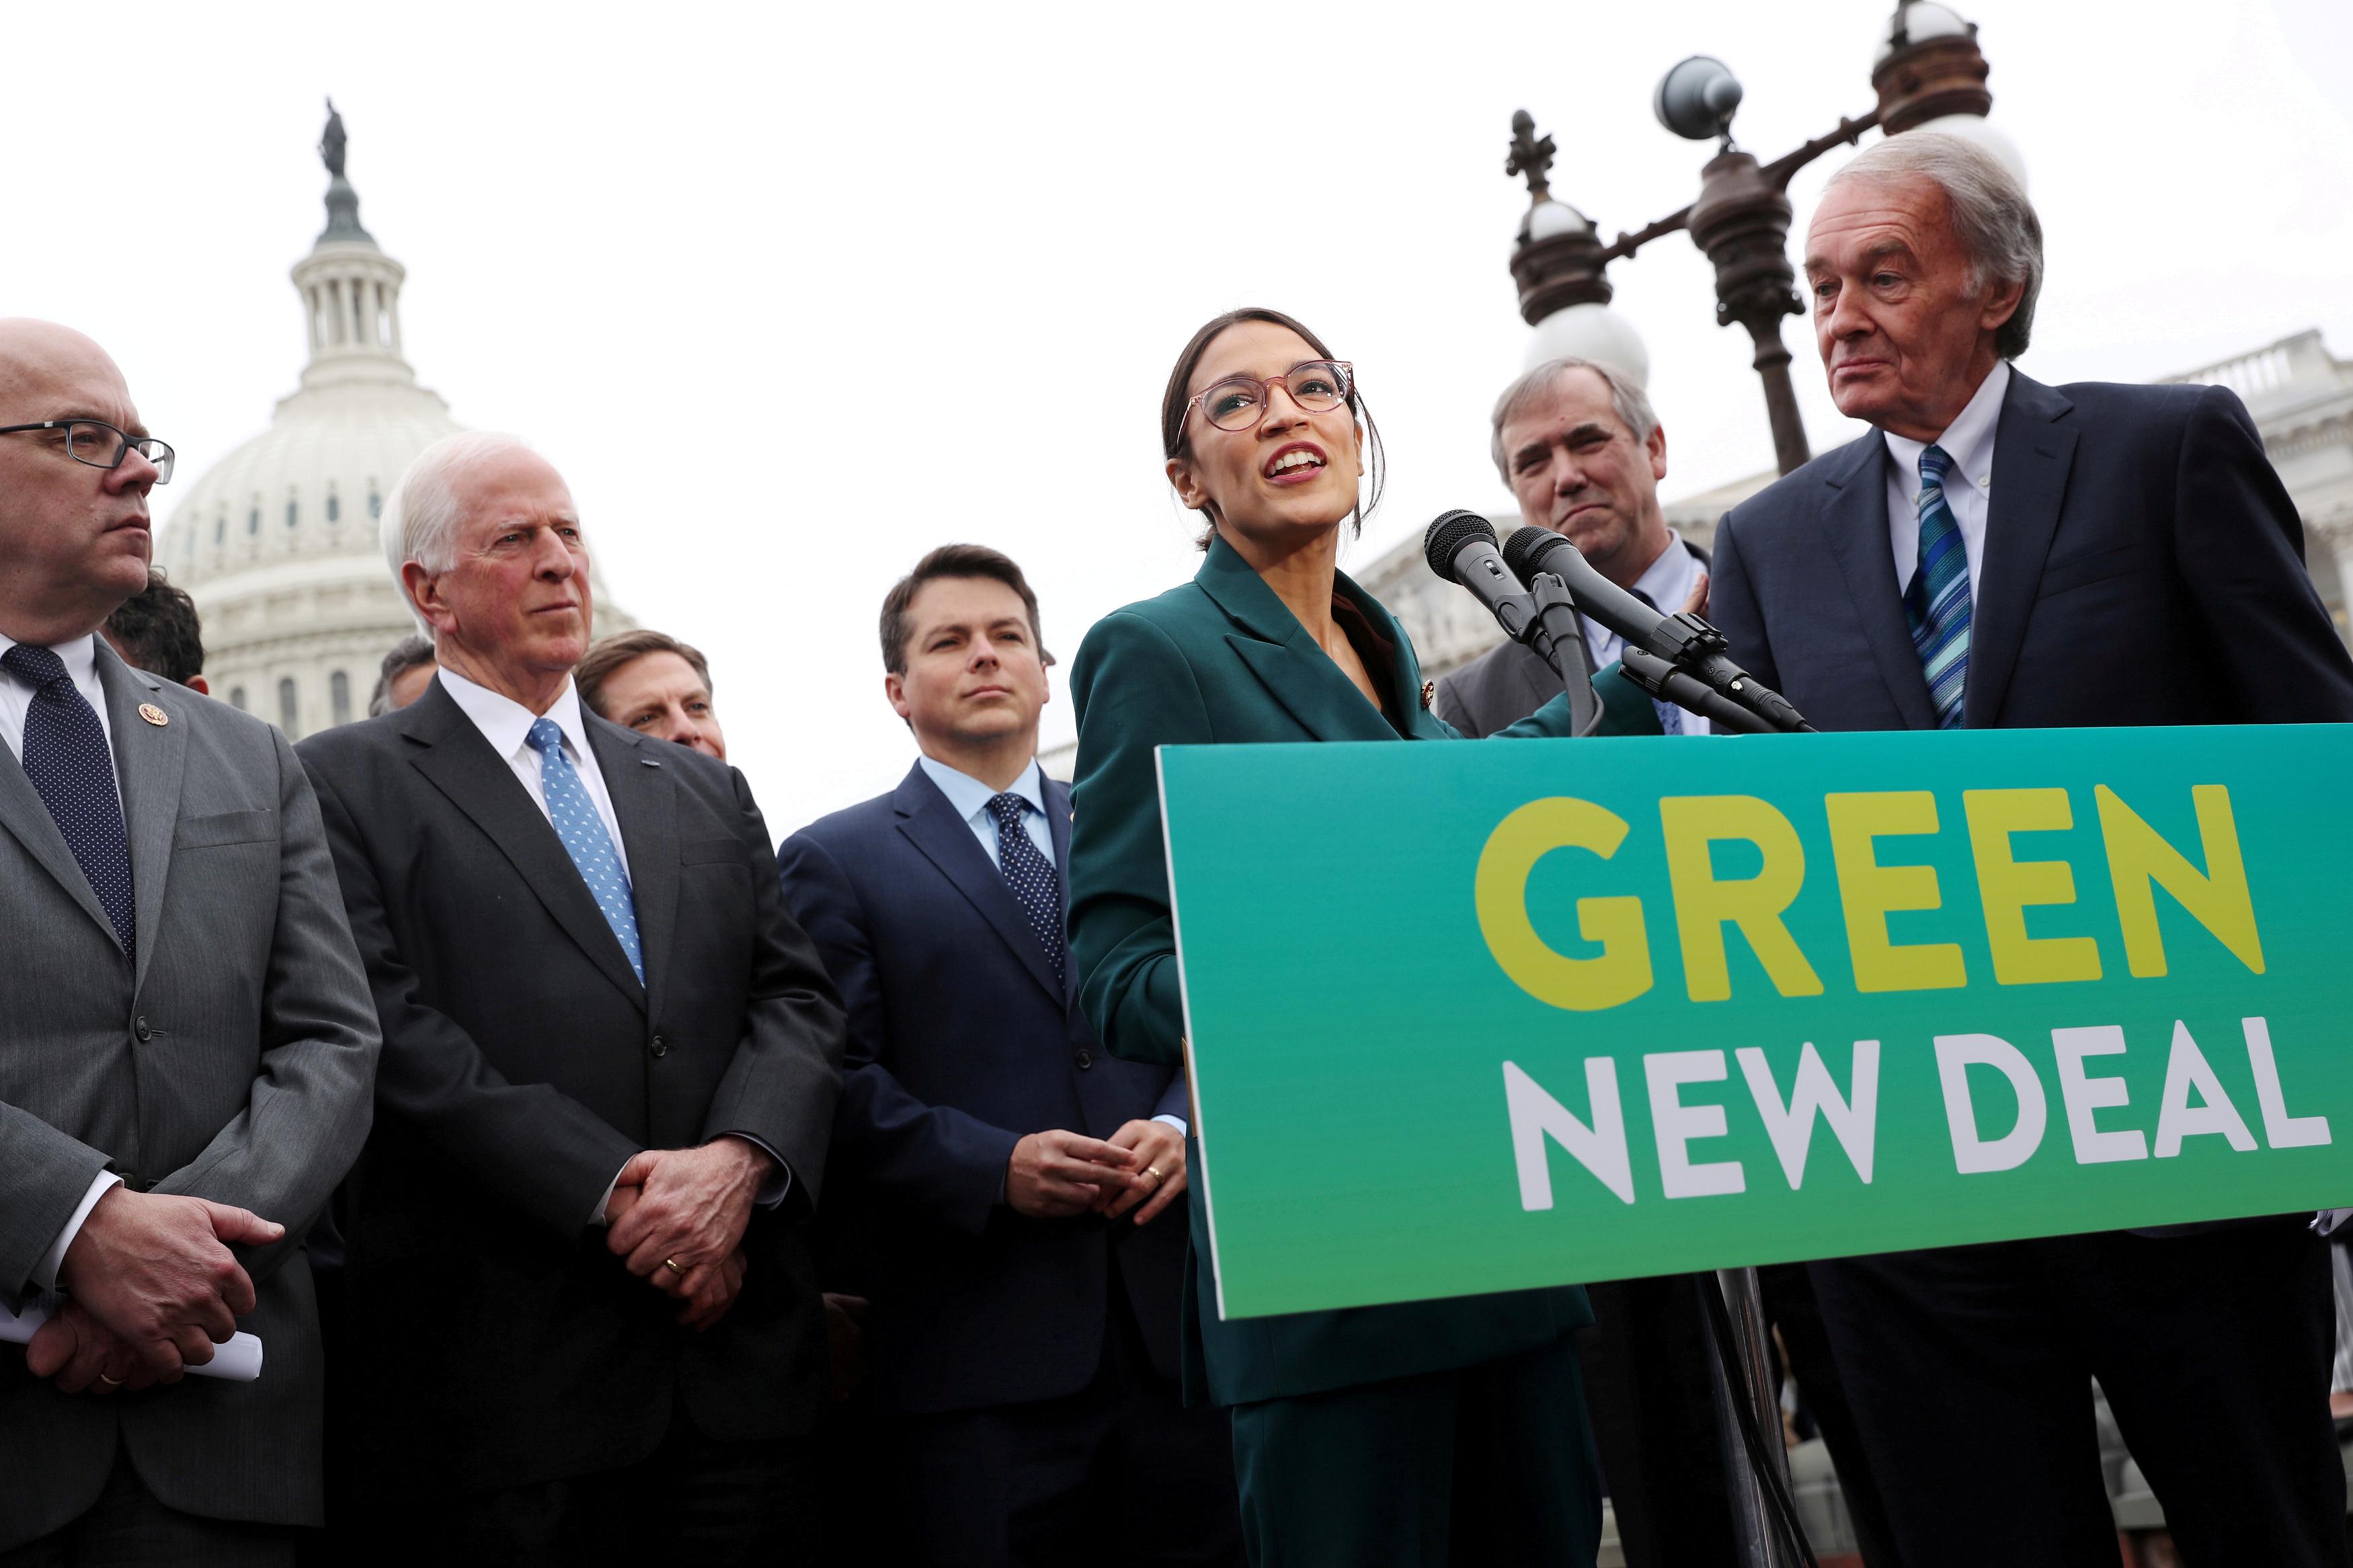 Rep. Alexandria Ocasio-Cortez (D-NY) and Senator Ed Markey, Green New Deal